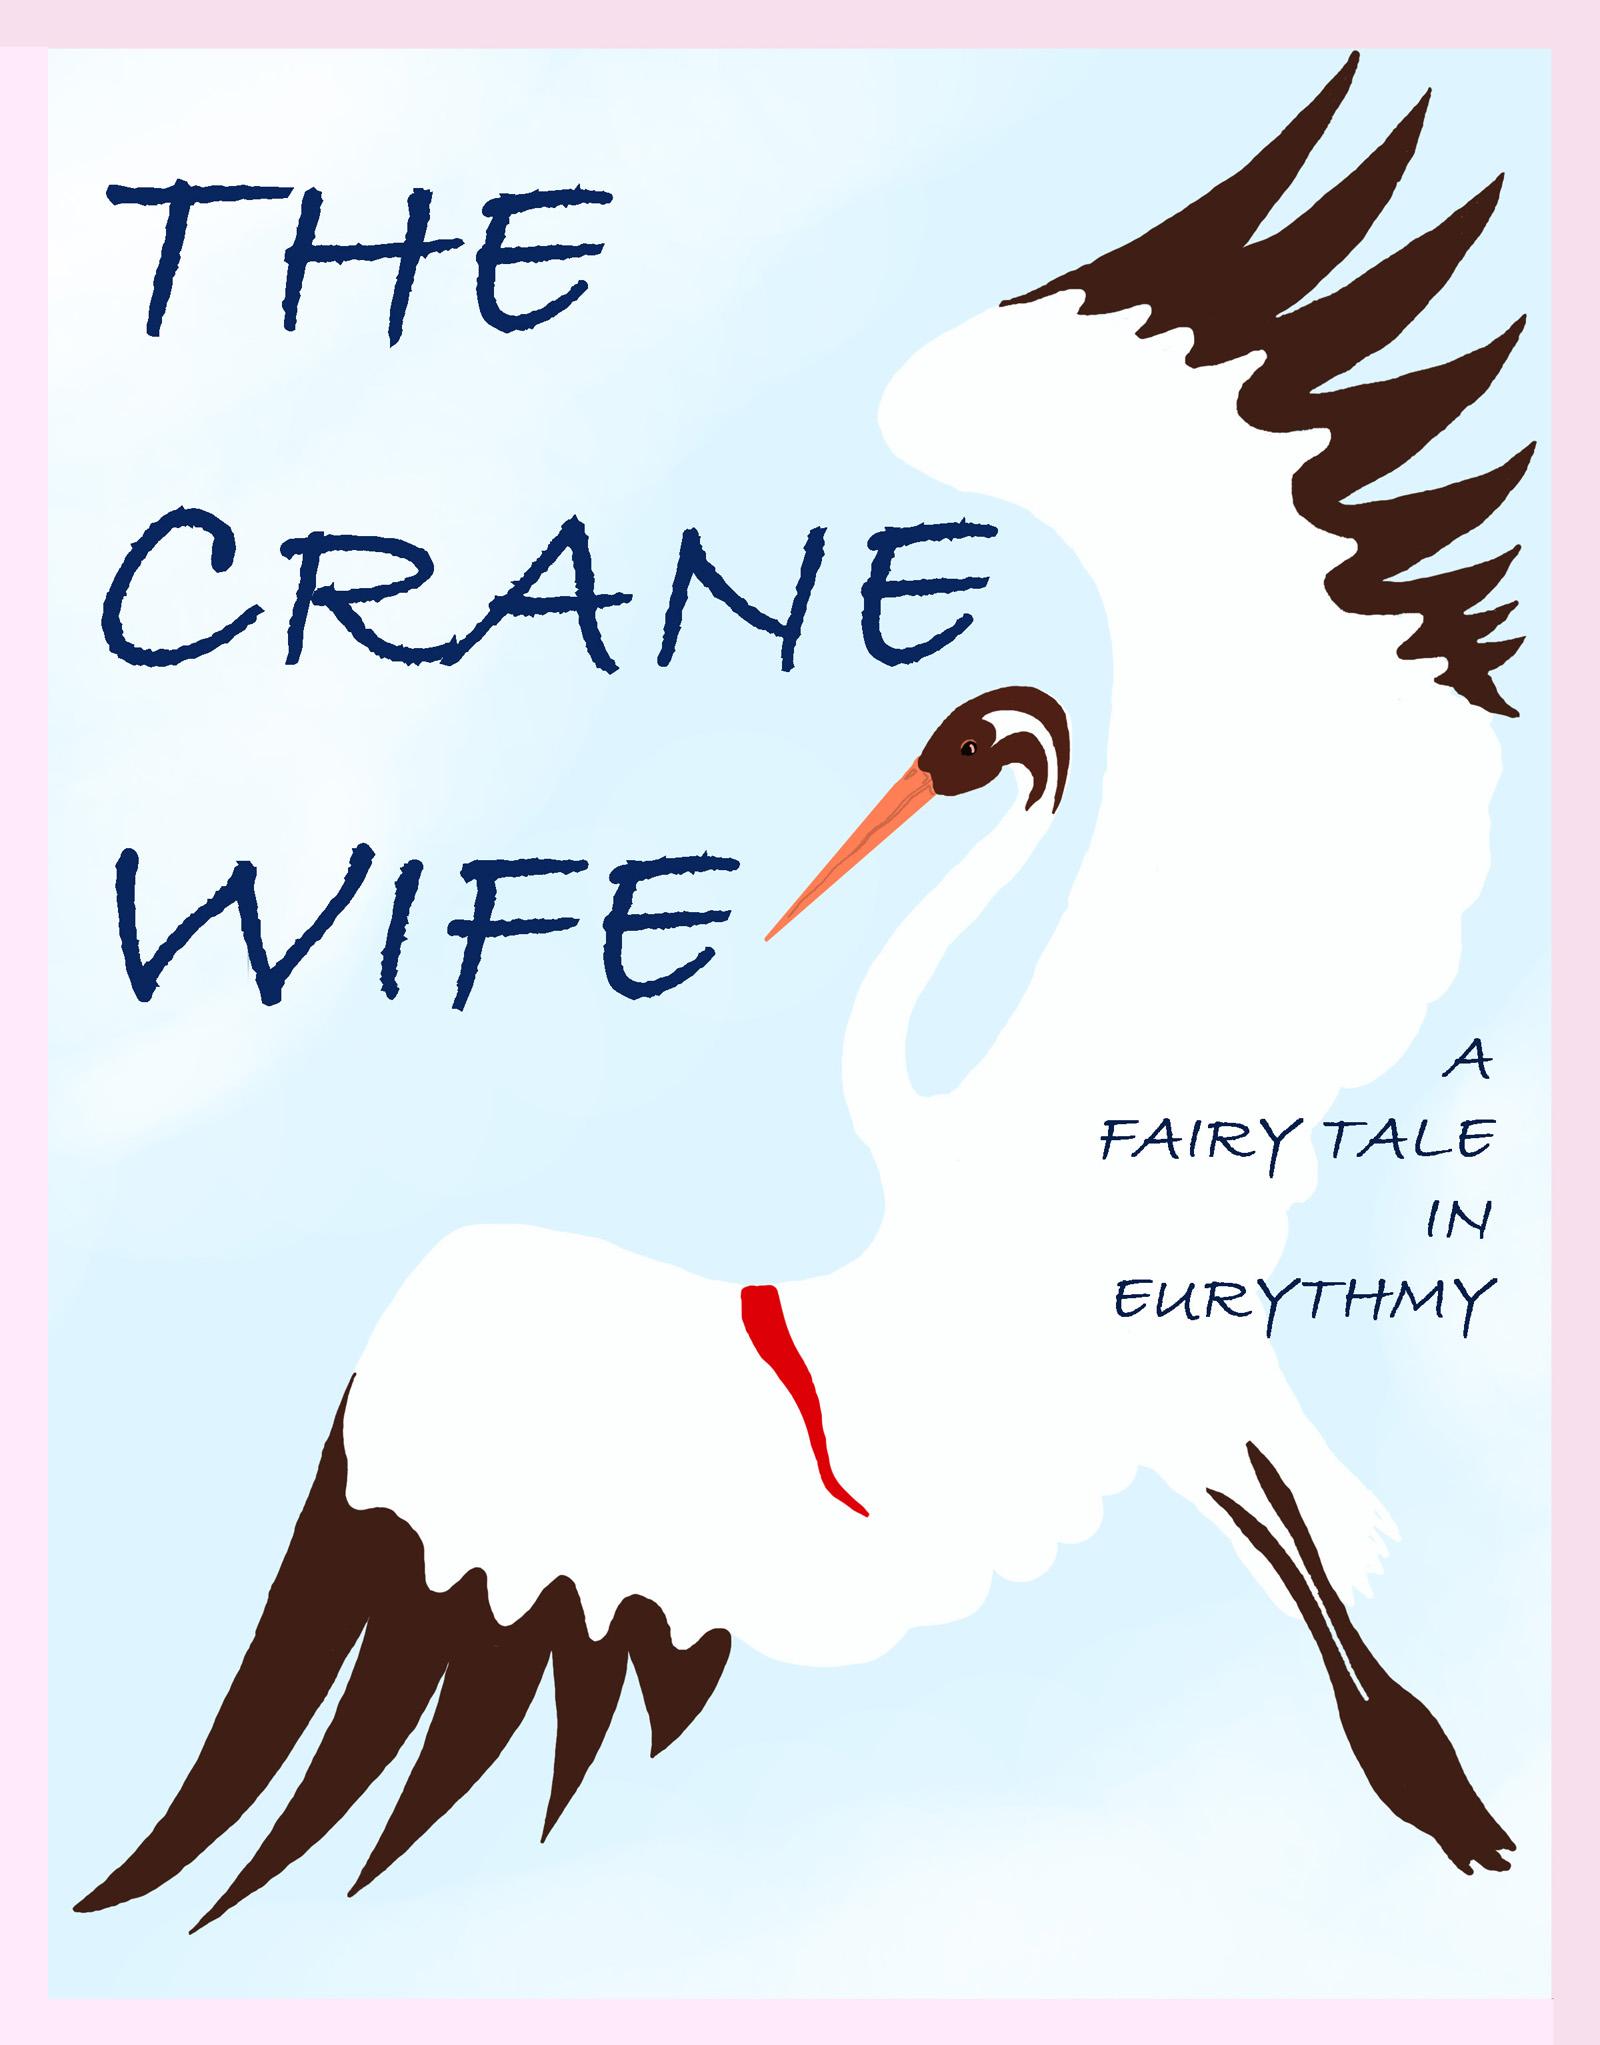 Crane Wife Poster - SqSp 7.jpg